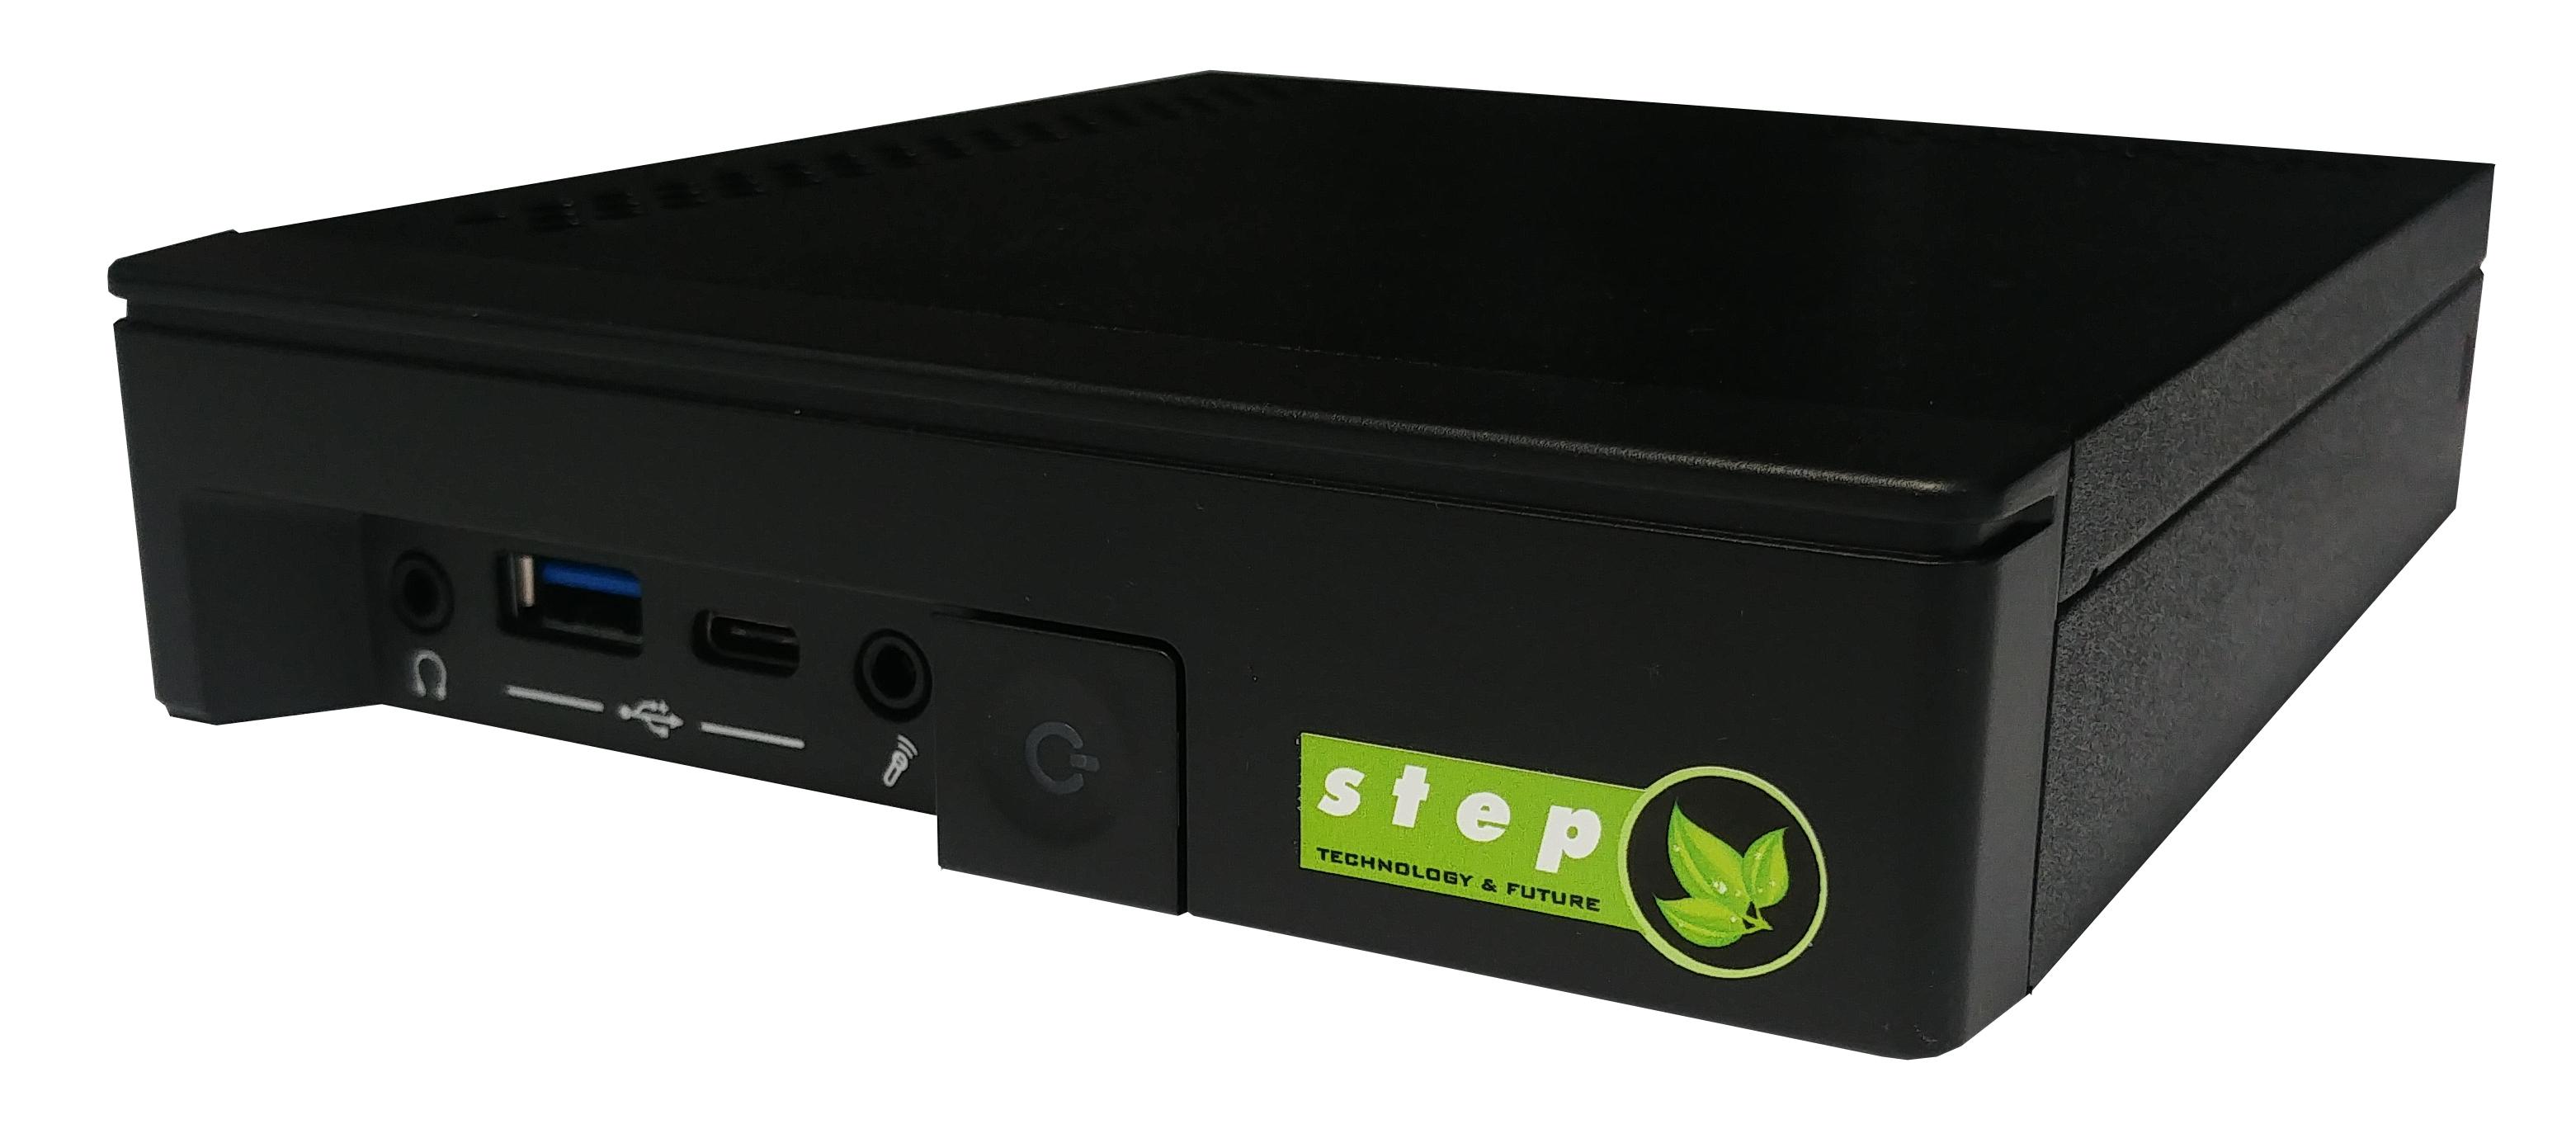 Step Micro DS808 - 2,8 GHz - Intel? Core? i5 der achten Generation - i5-8400 - 8 GB - 256 GB - Windows 10 Pro